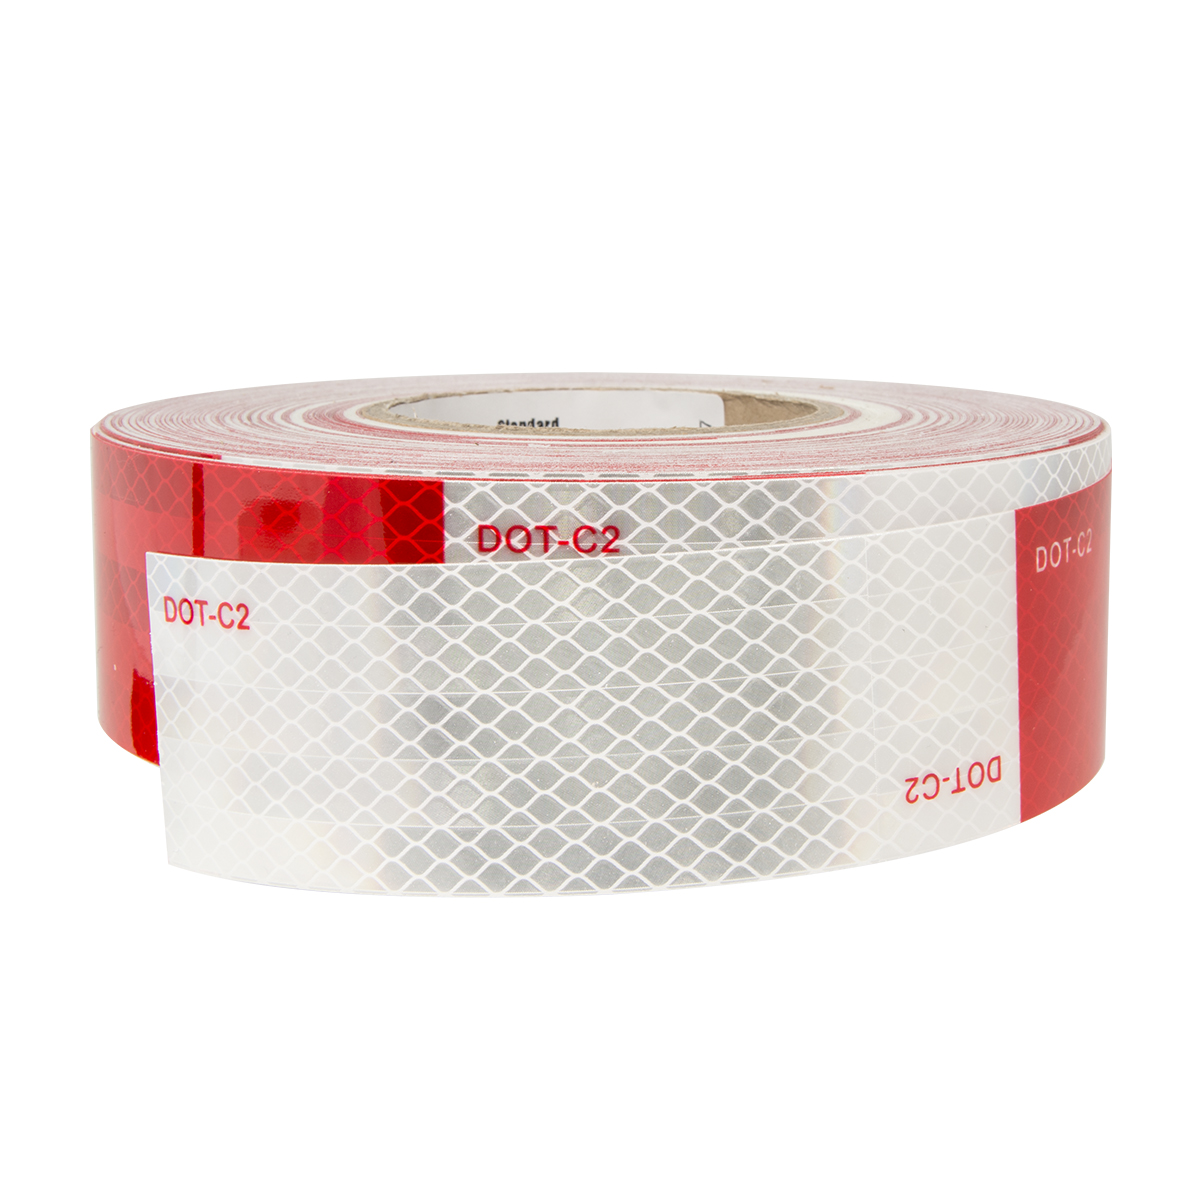 Premium Hi Viz DOT-C2 Conspicuity Tape in Red & White 150' Roll